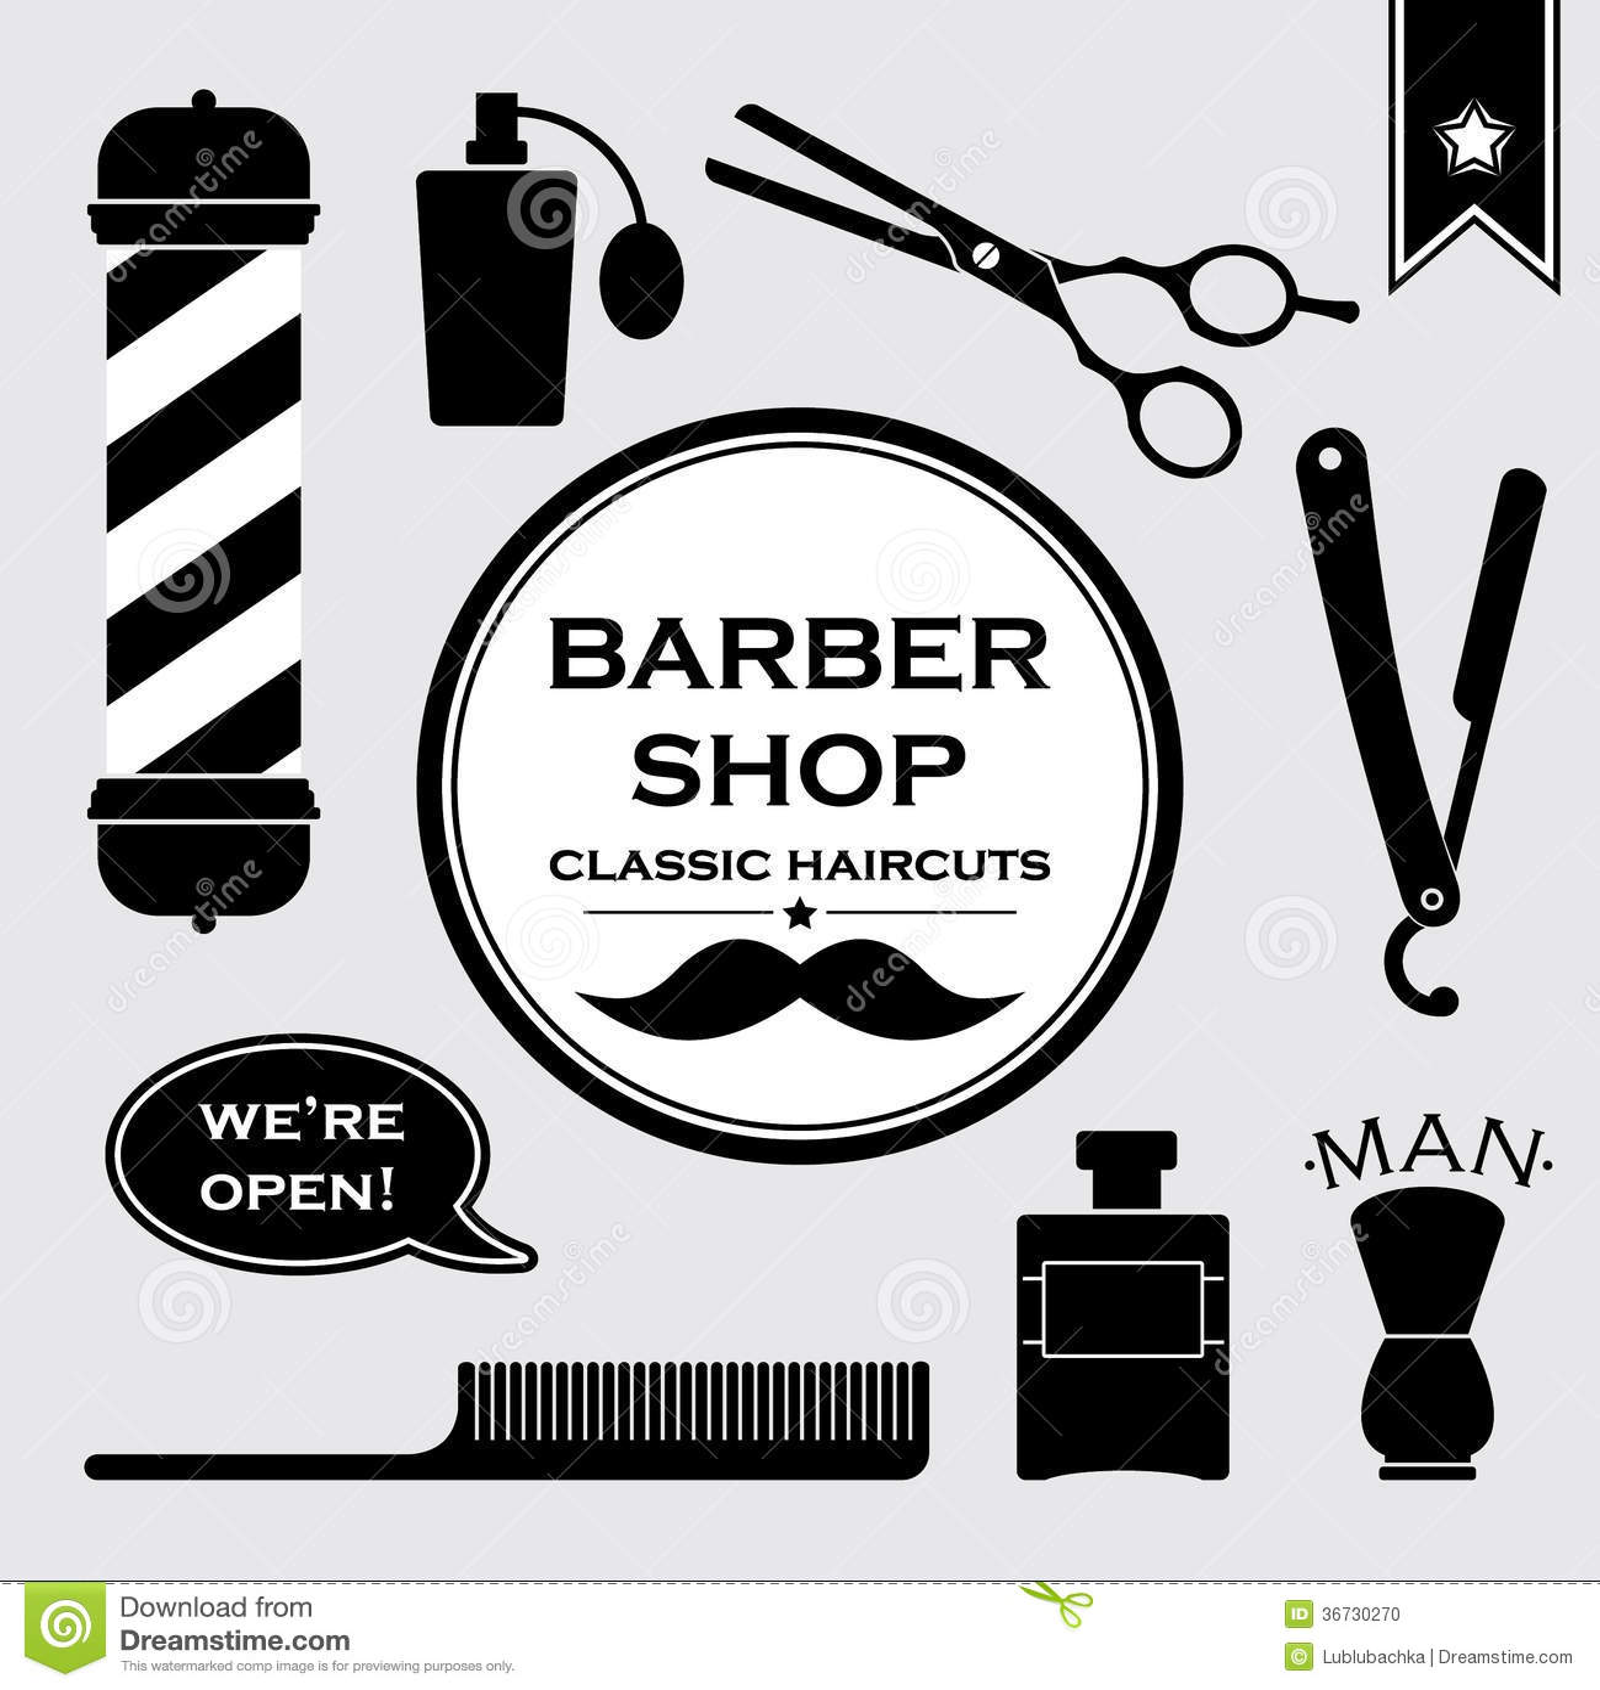 Clip art vector of vintage barber shop logo graphics and icon vector - Barbershop Vintage Symbols In Set Stock Photo Barbershop Set Vector